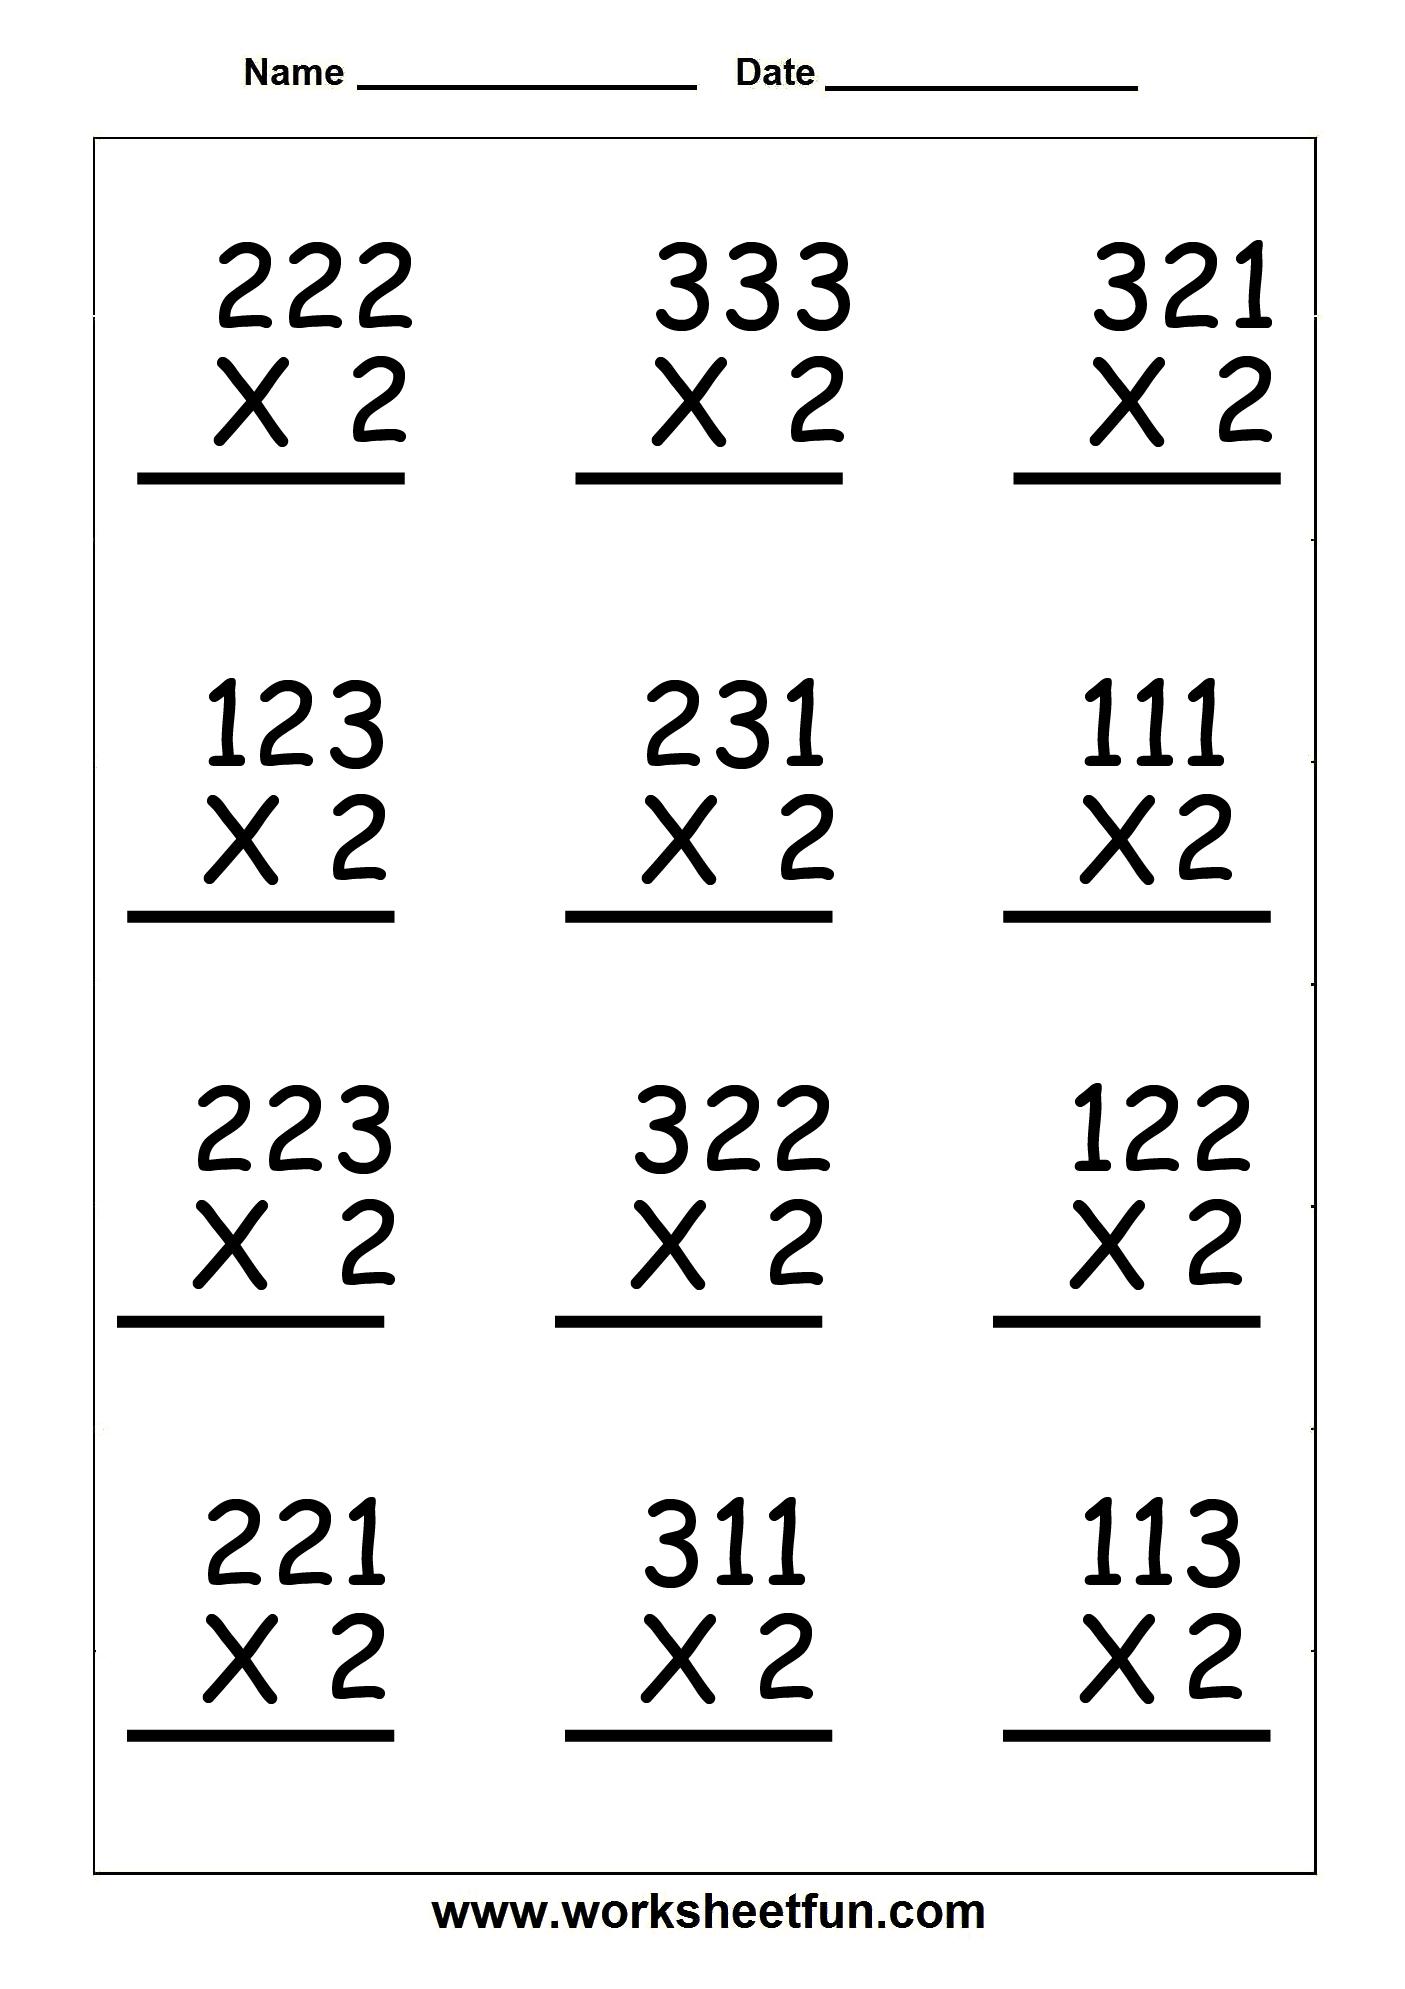 Copy Of Single Digit Multiplication Worksheets - Lessons throughout Printable 2 Digit Multiplication